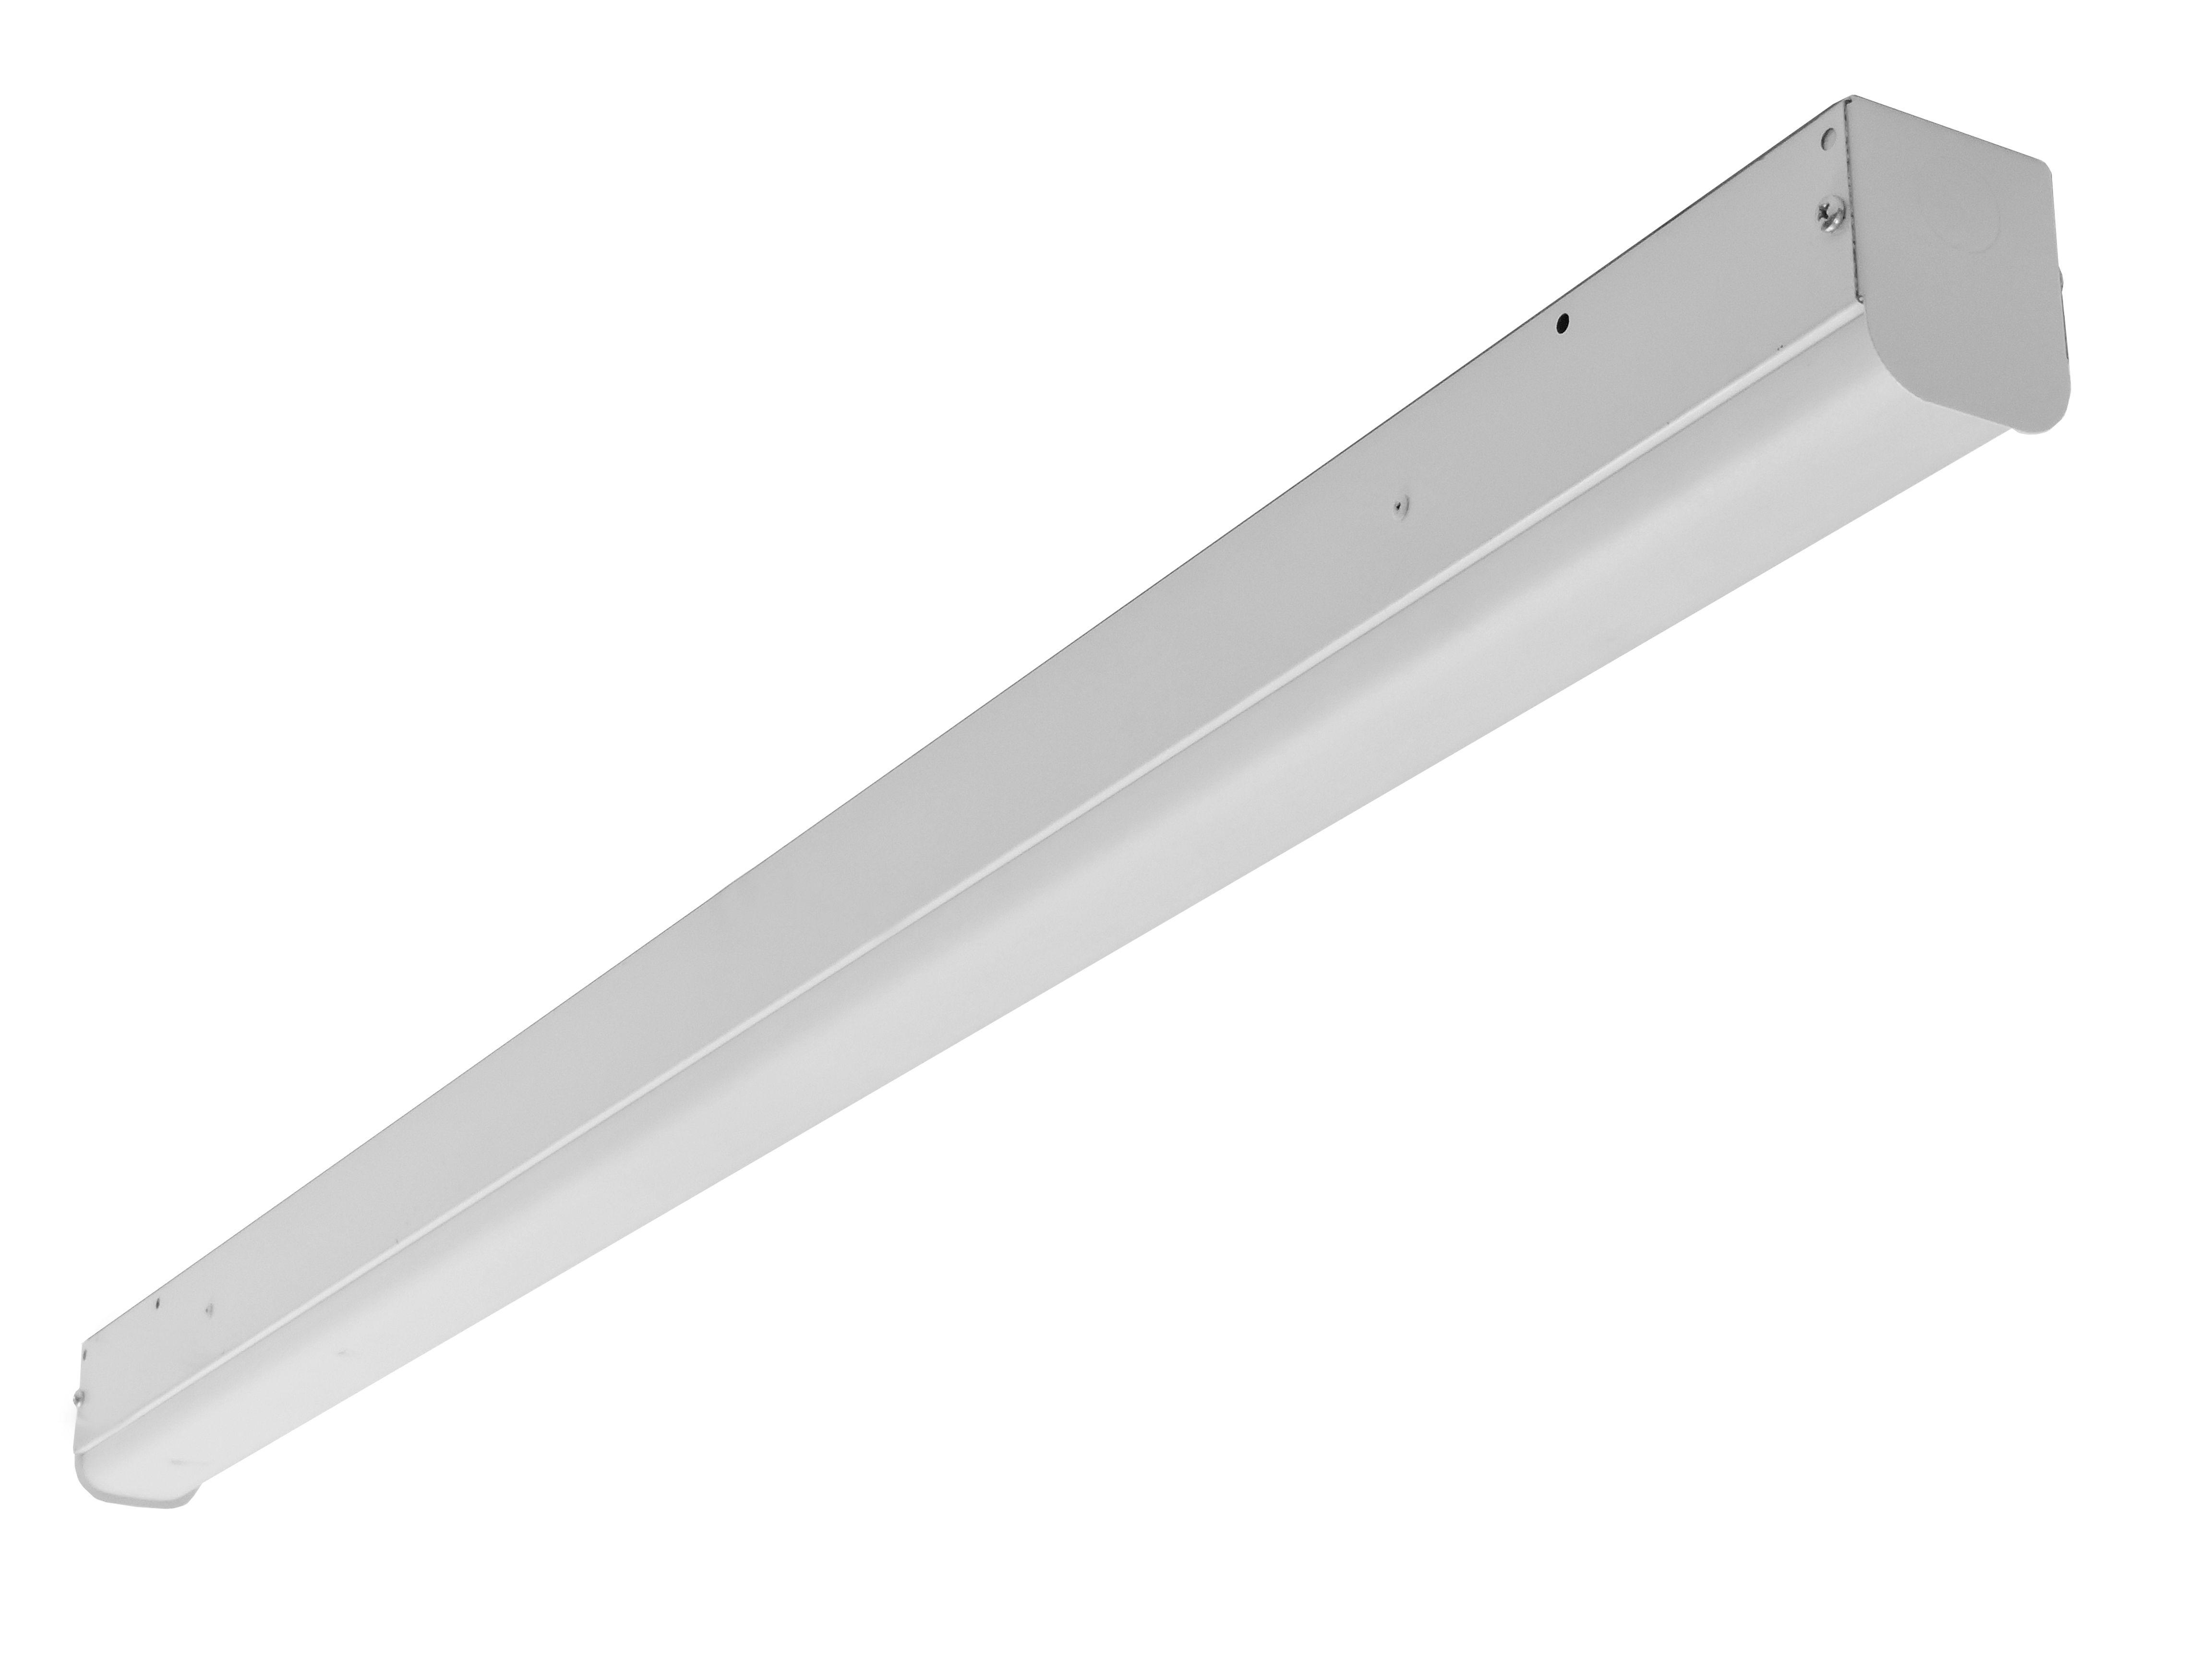 4 Foot Led Lights >> La Lighting 3 Stw100 Series 4 Foot Led Strip Lighting Fixture